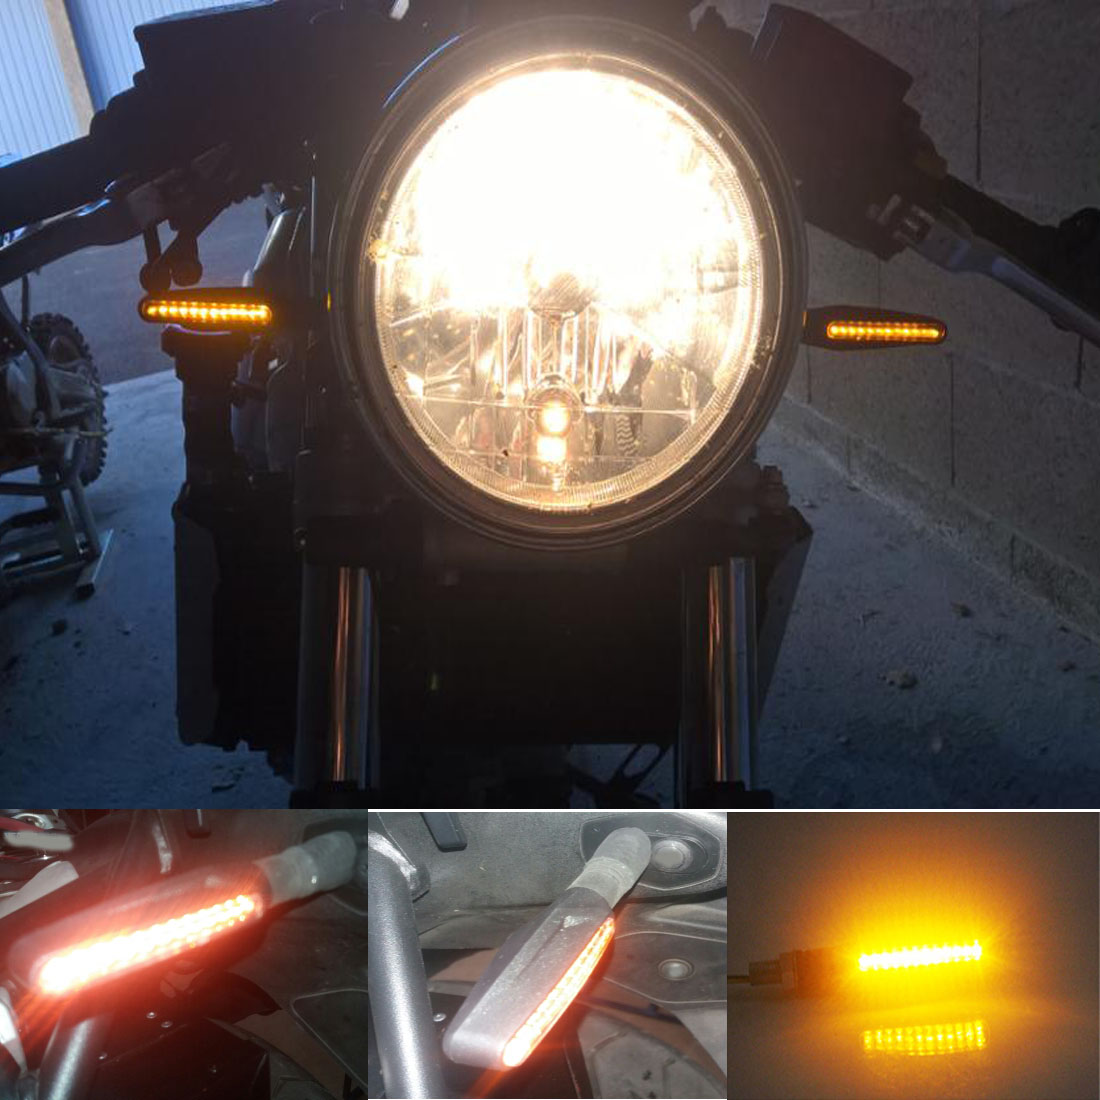 Motorcycle Turn Signal Light Lamp Flexible 12 LED Turn Signals Indicators Blinkers Flashers Lights For Honda GROM MSX125 1 Pairs